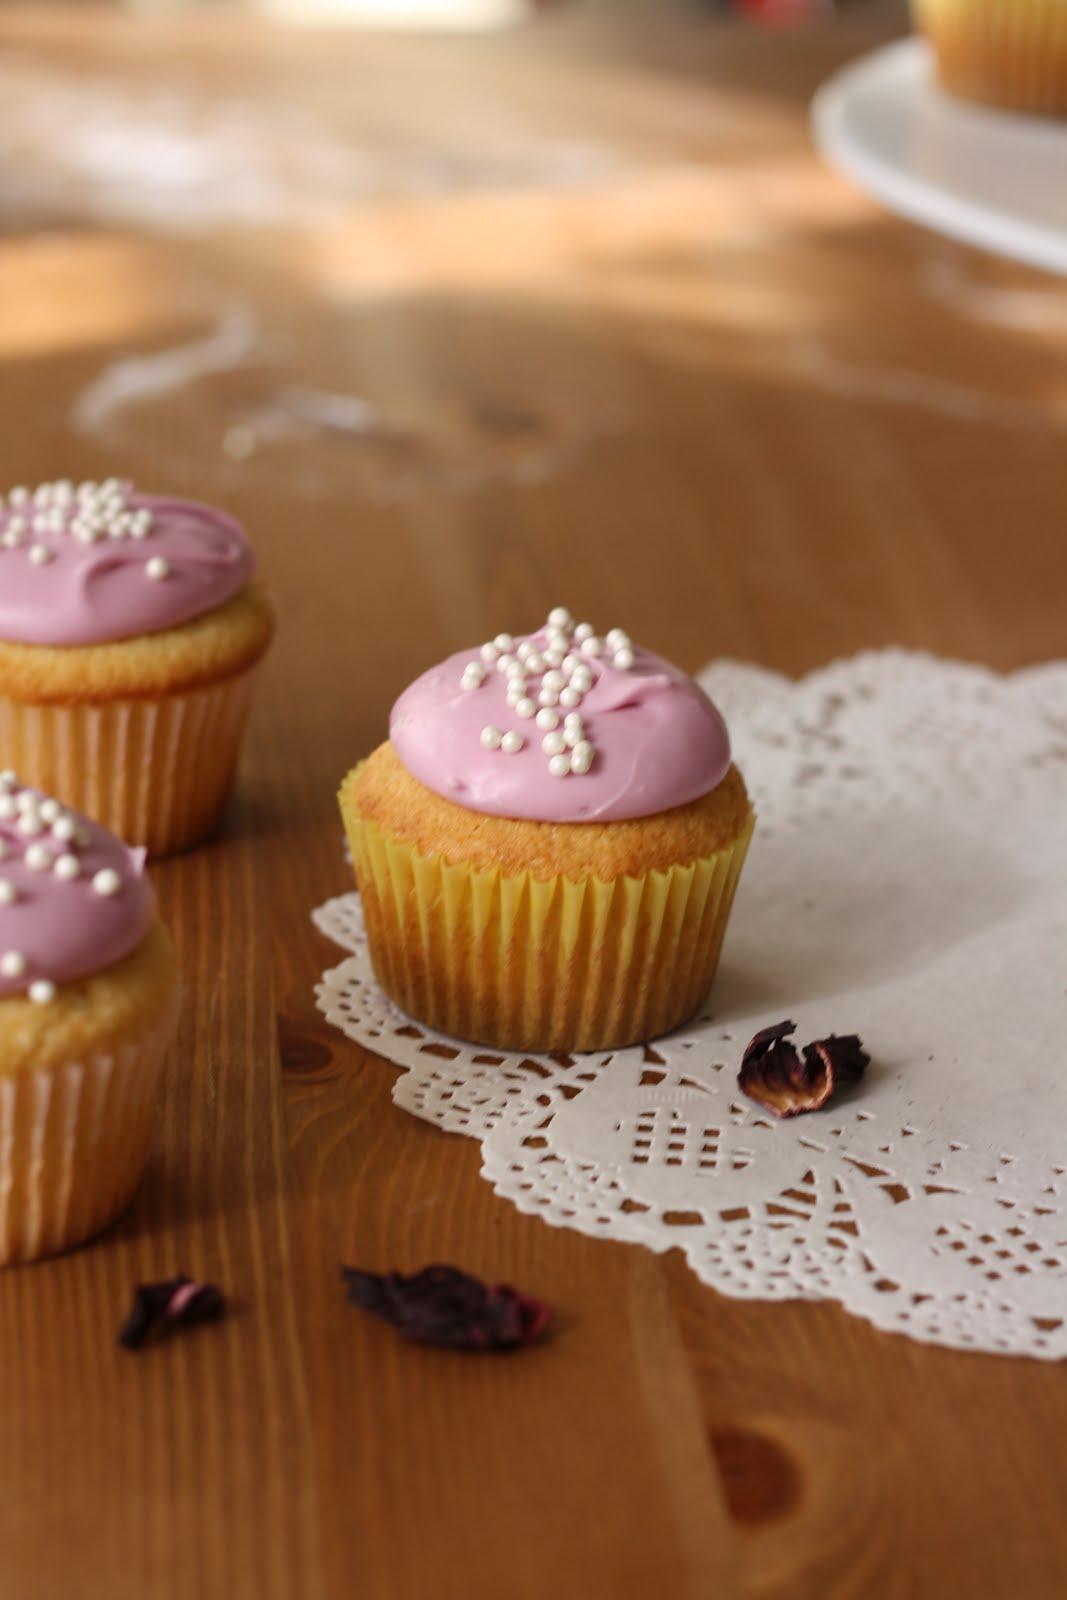 Hummingbird Bakery Lemon Cupcakes With Hibiscus Cream Cheese